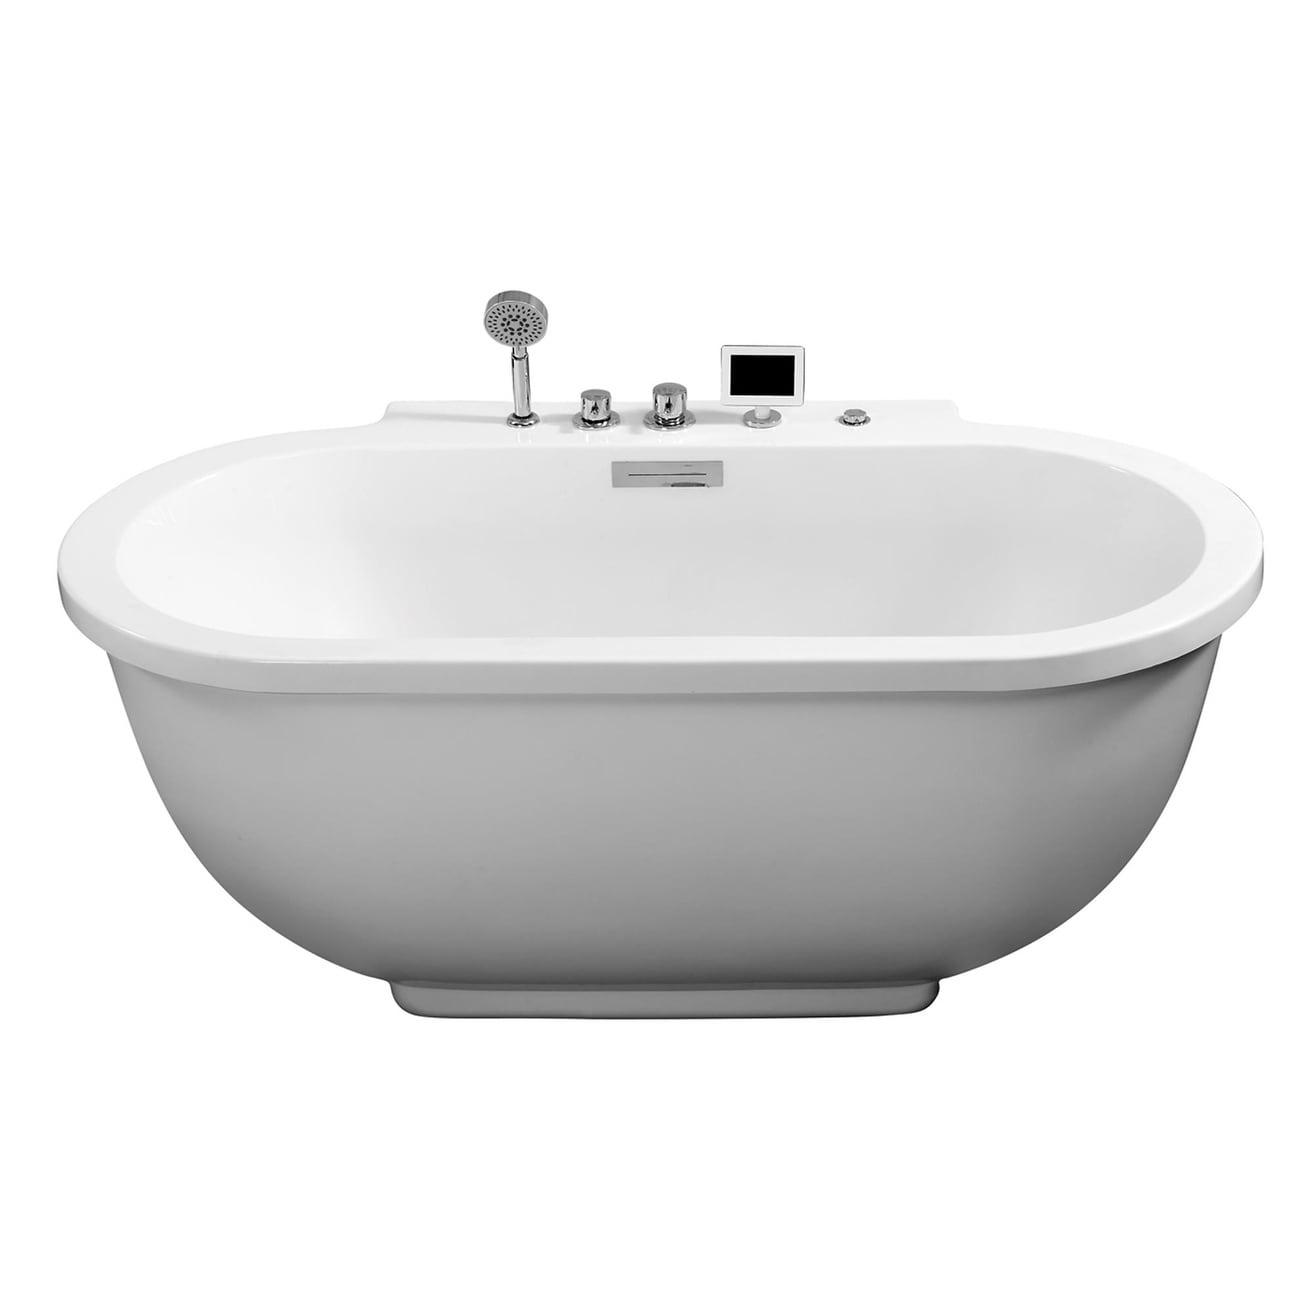 Acrylic Bathtubs | Shop our Best Home Improvement Deals Online at ...